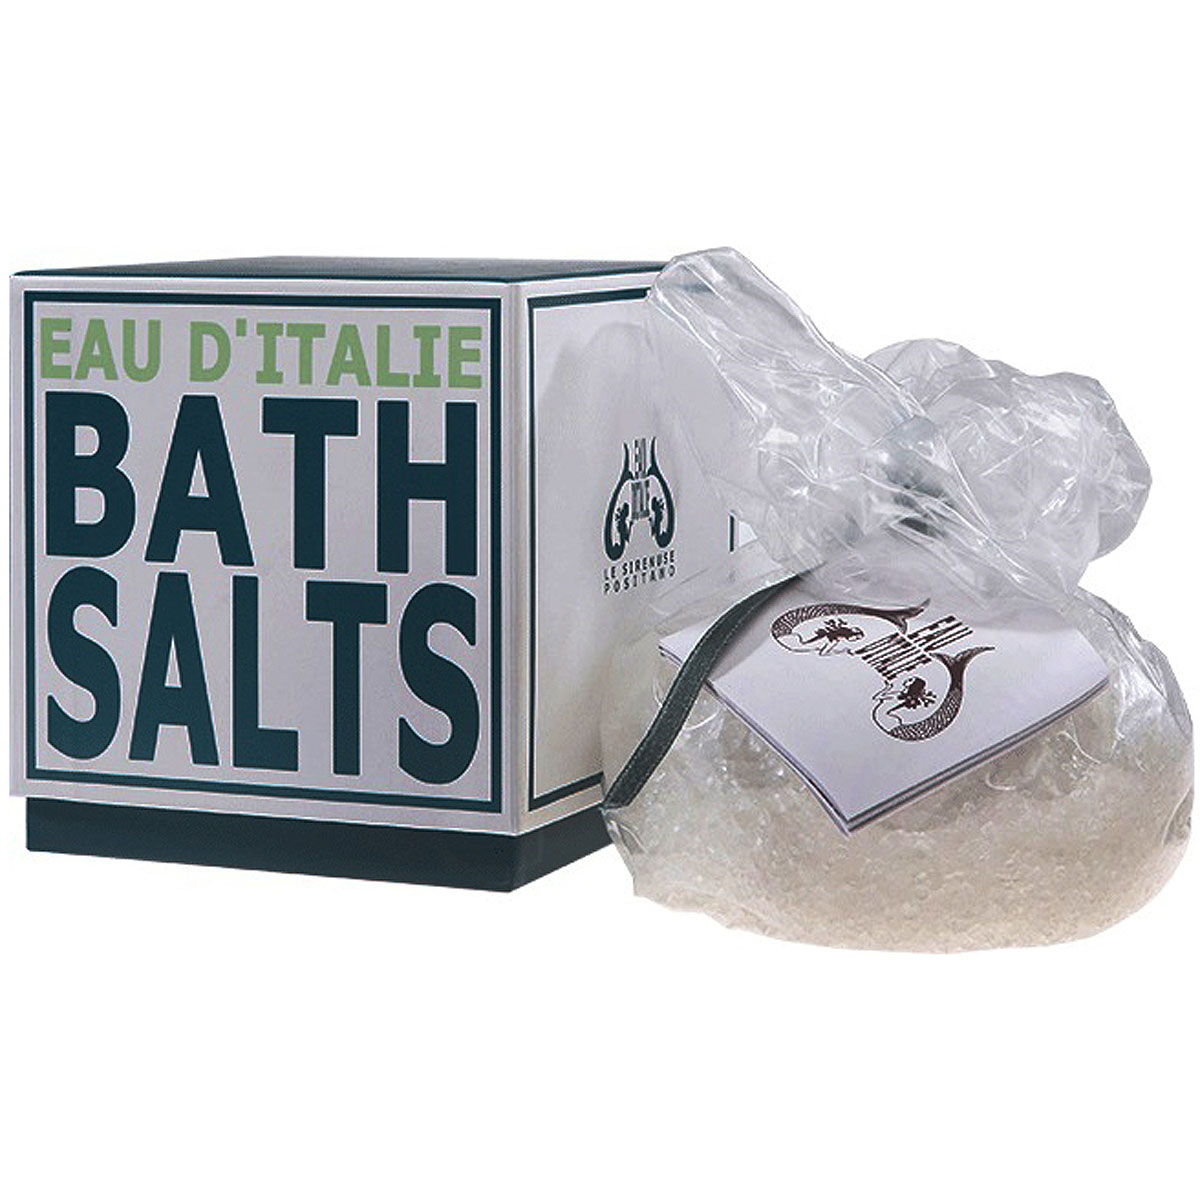 Eau D Italie Beauty for Women, Eau D Italie - Bath Salts - 500 Gr, 2019, 500 gr